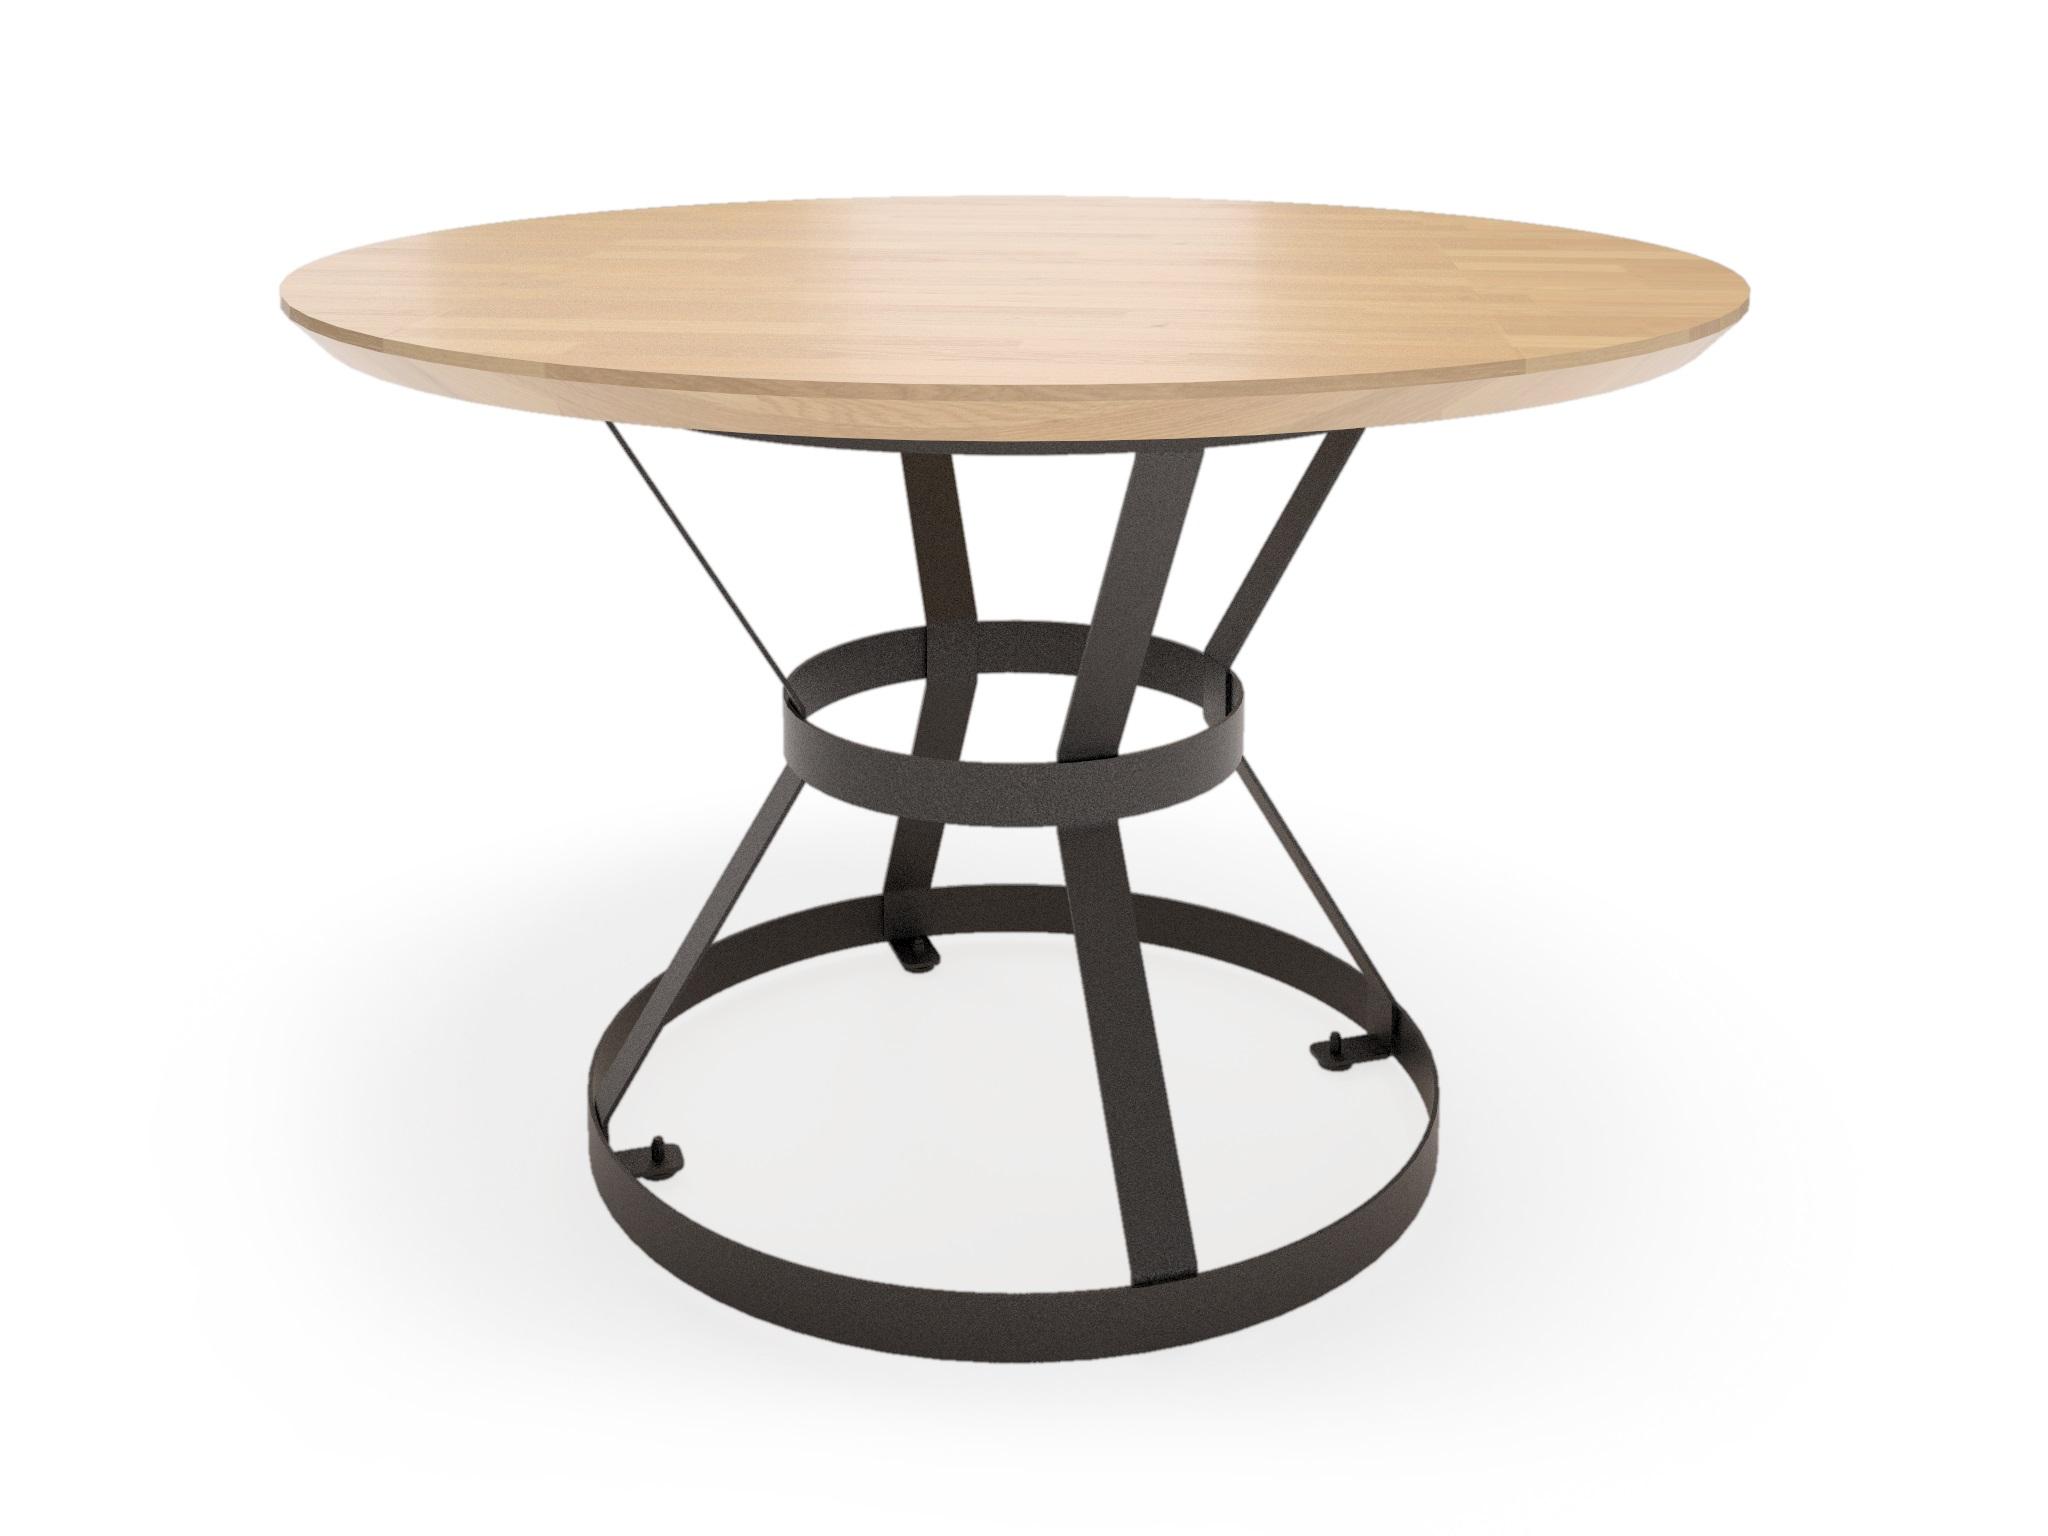 Кухонный стол Millwood 15436804 от thefurnish